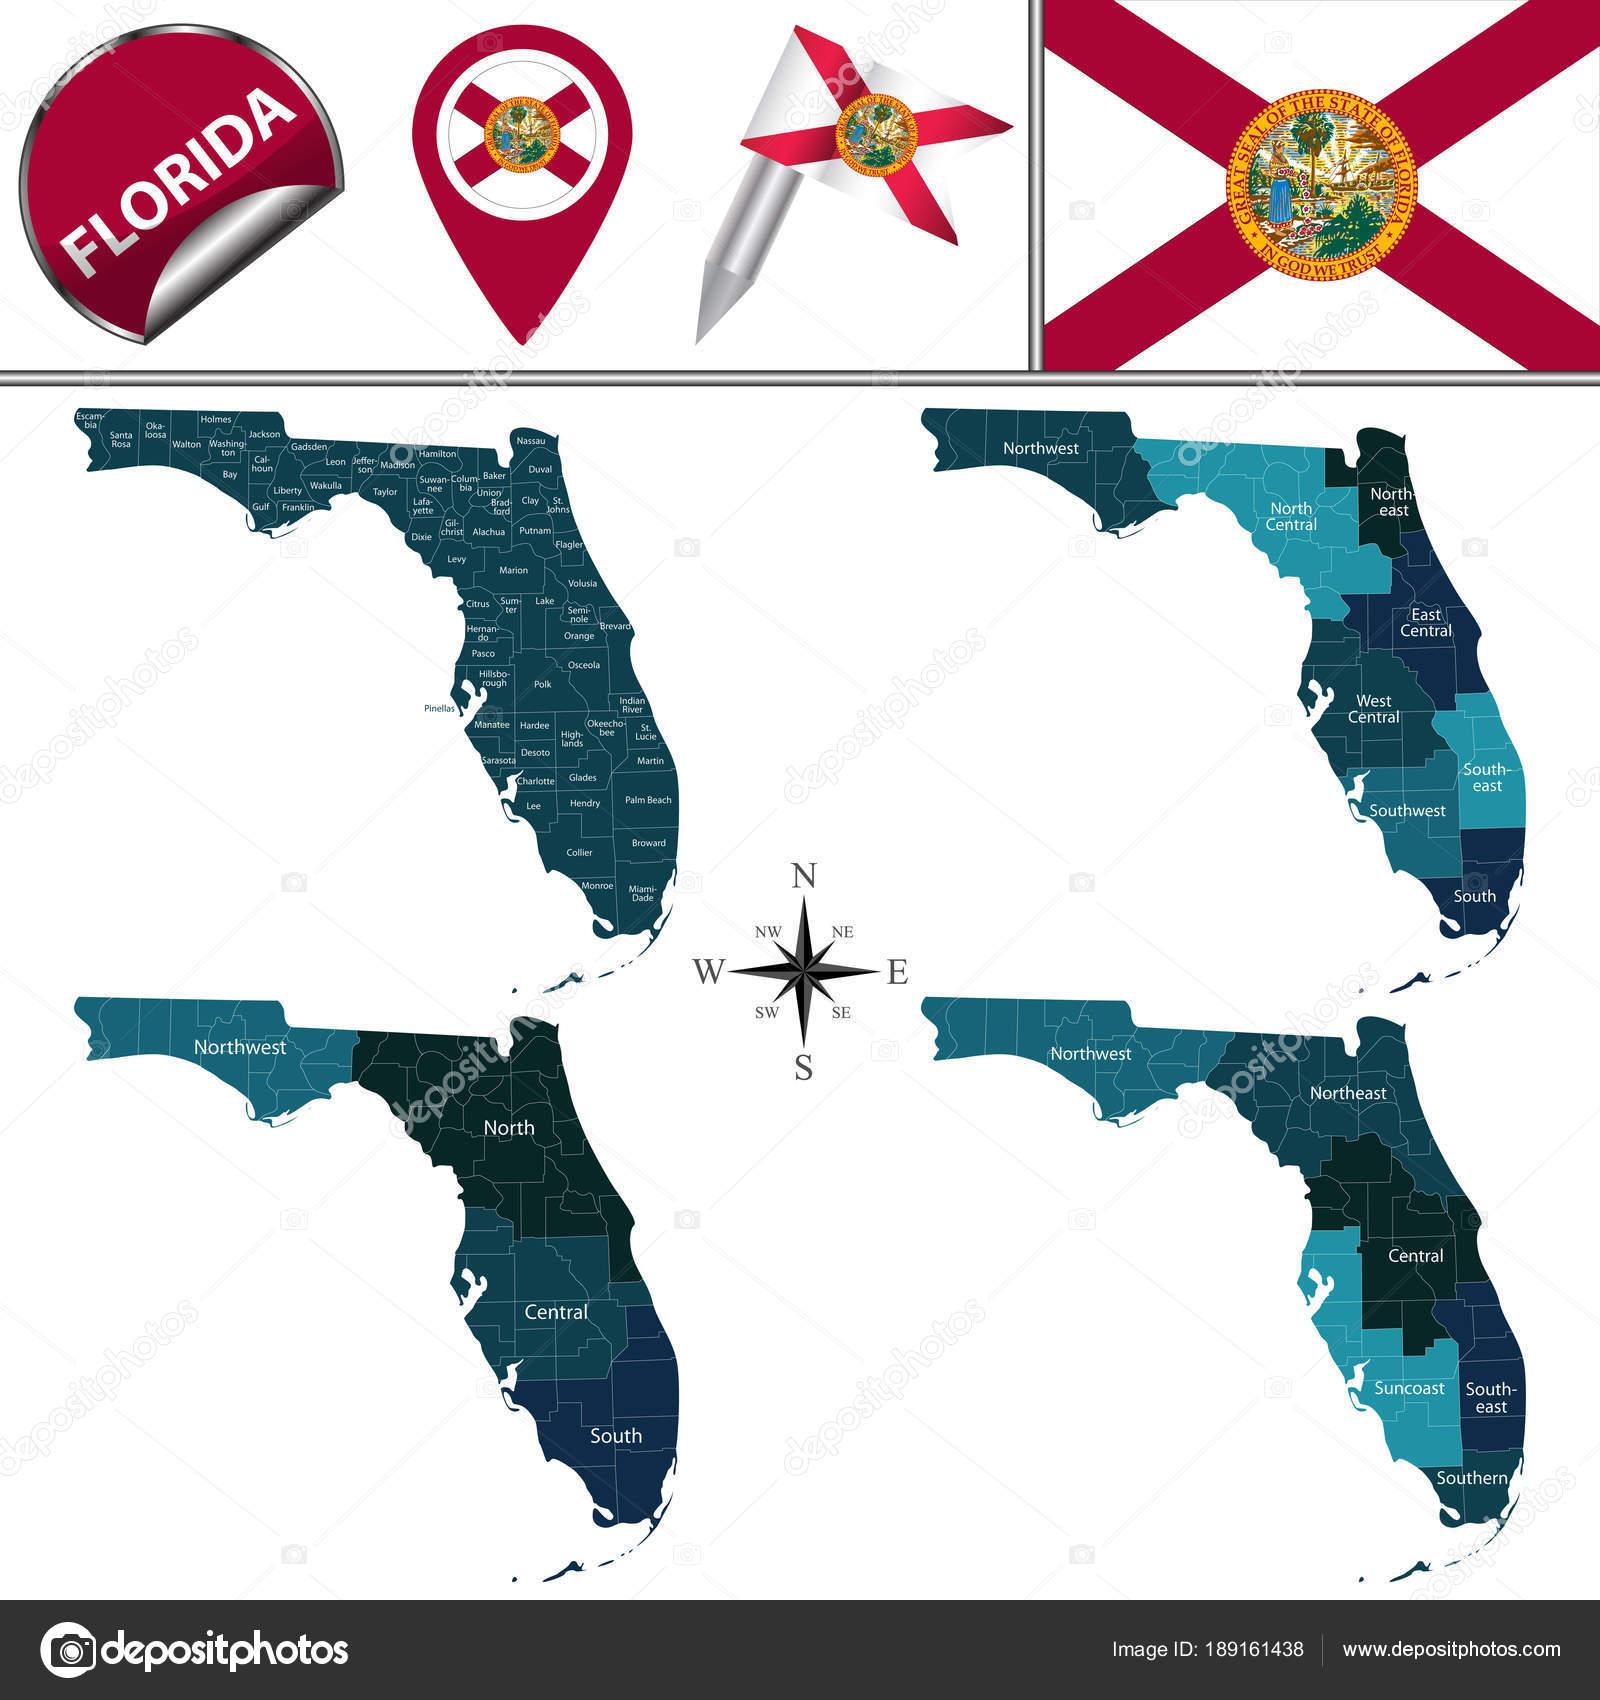 Florida Regions Map.Map Of Florida With Regions Stock Vector C Sateda 189161438